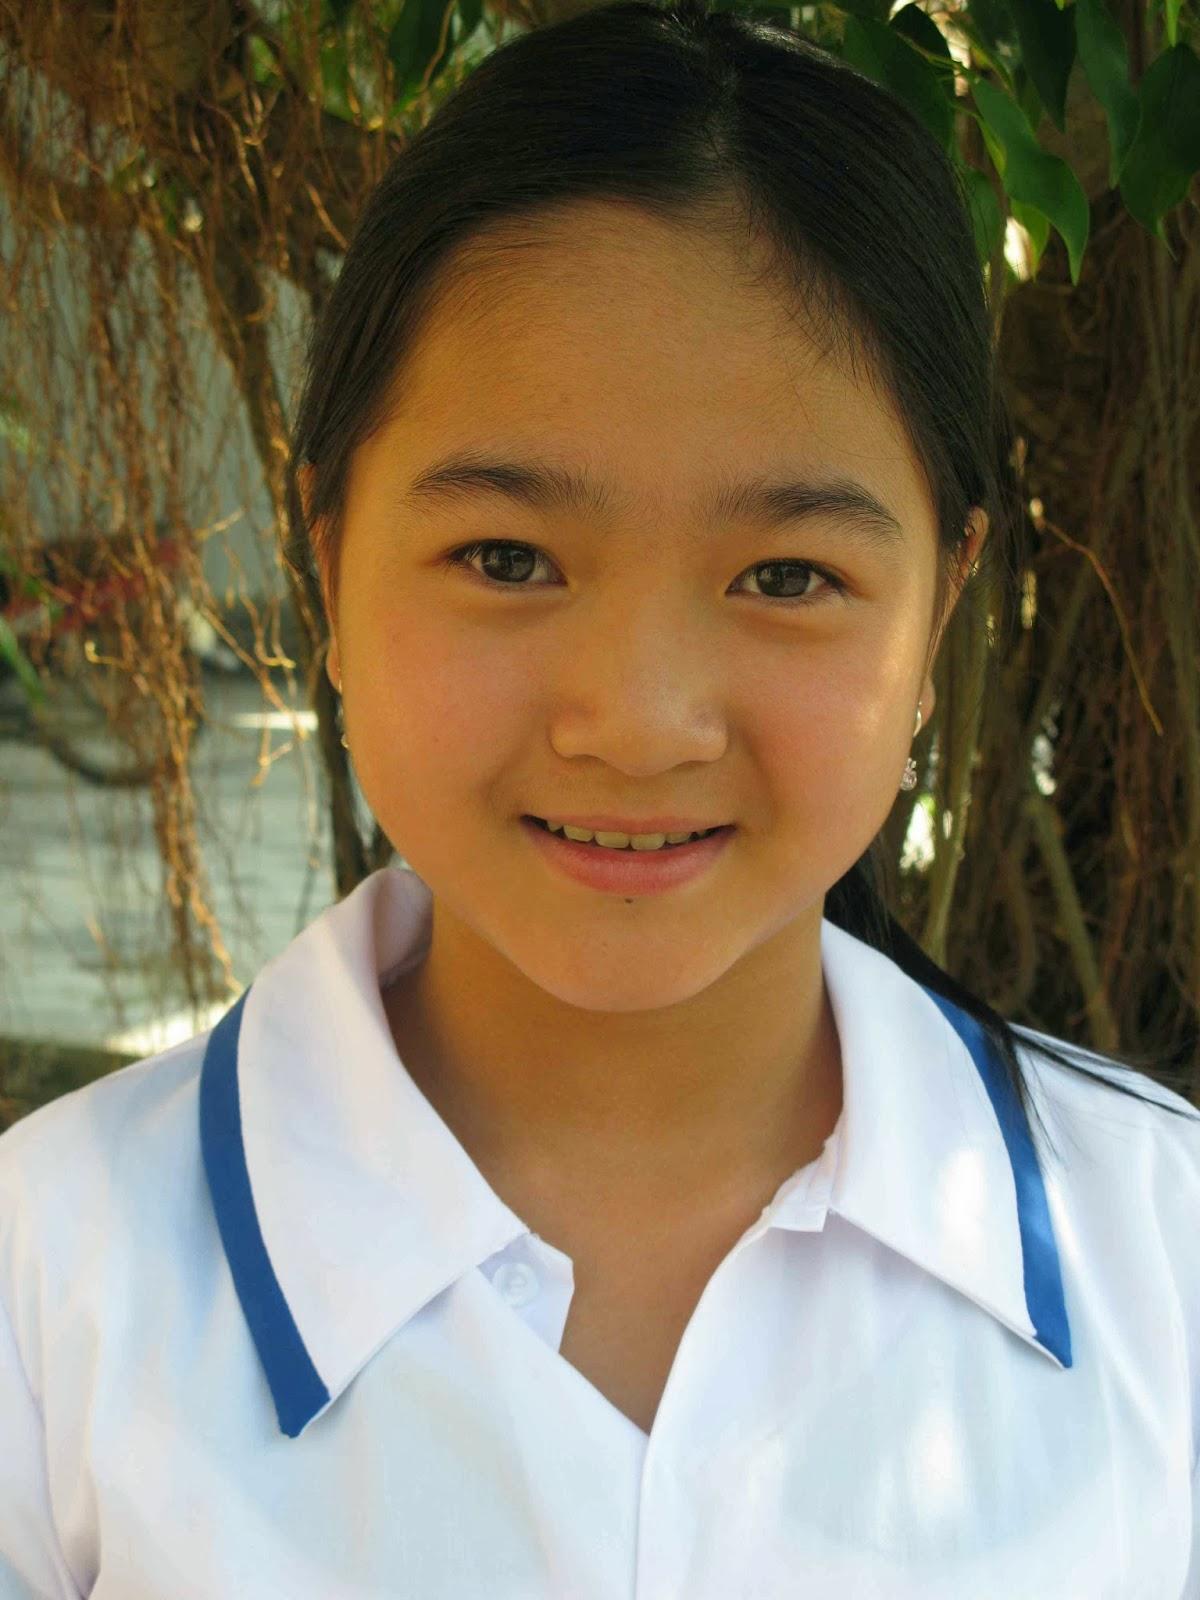 Children's Education Foundation - Vietnam: Girls in need